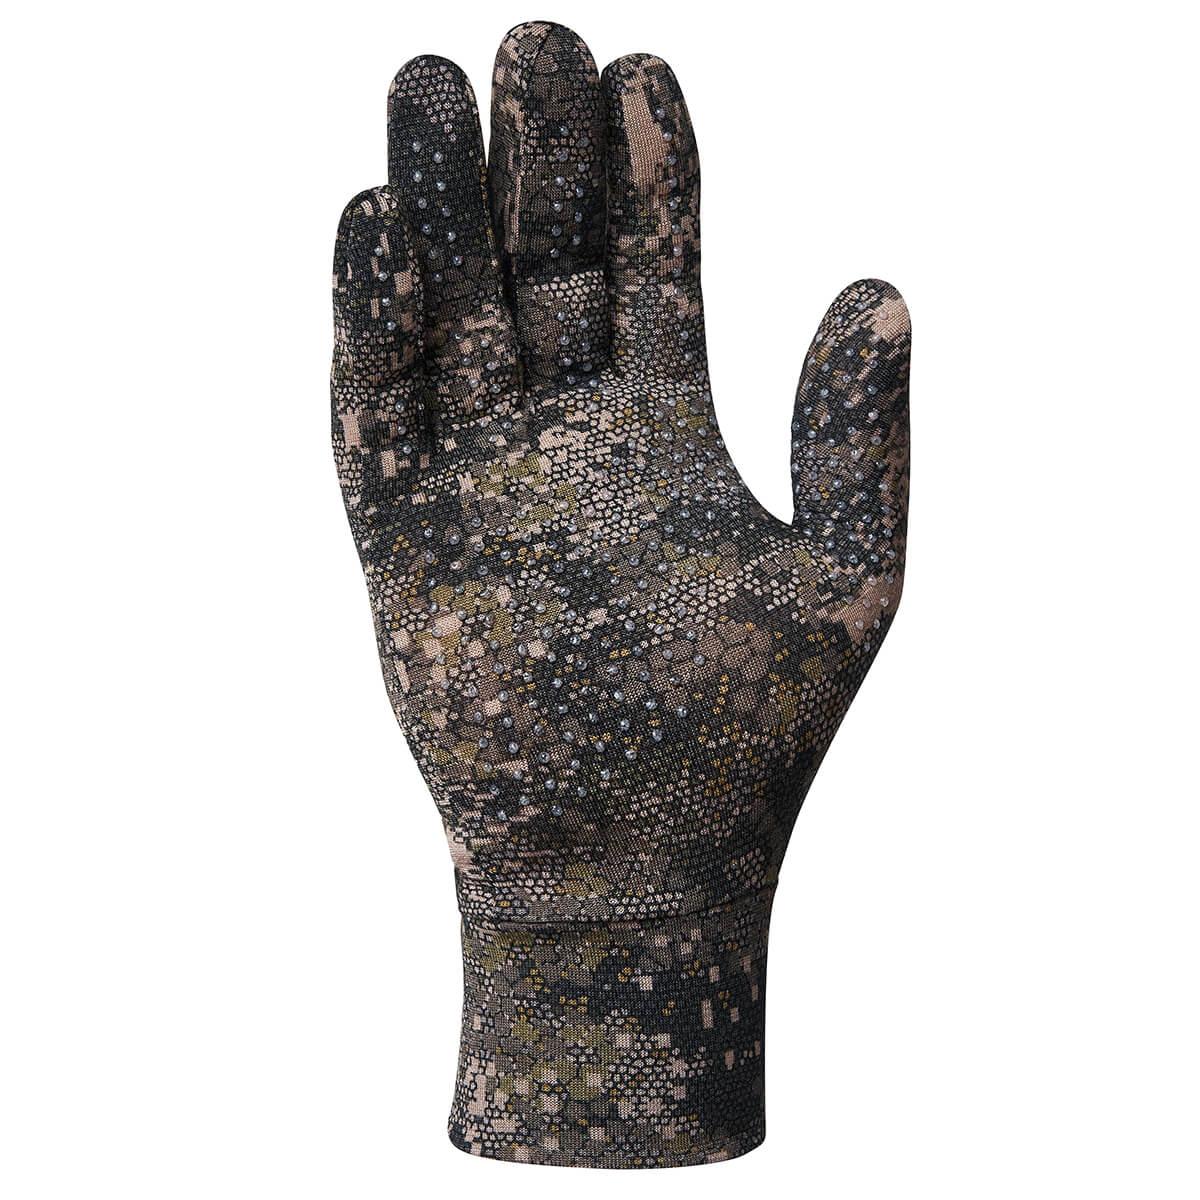 Thermowave Handschuhe Liner (camo) - Handschuhe